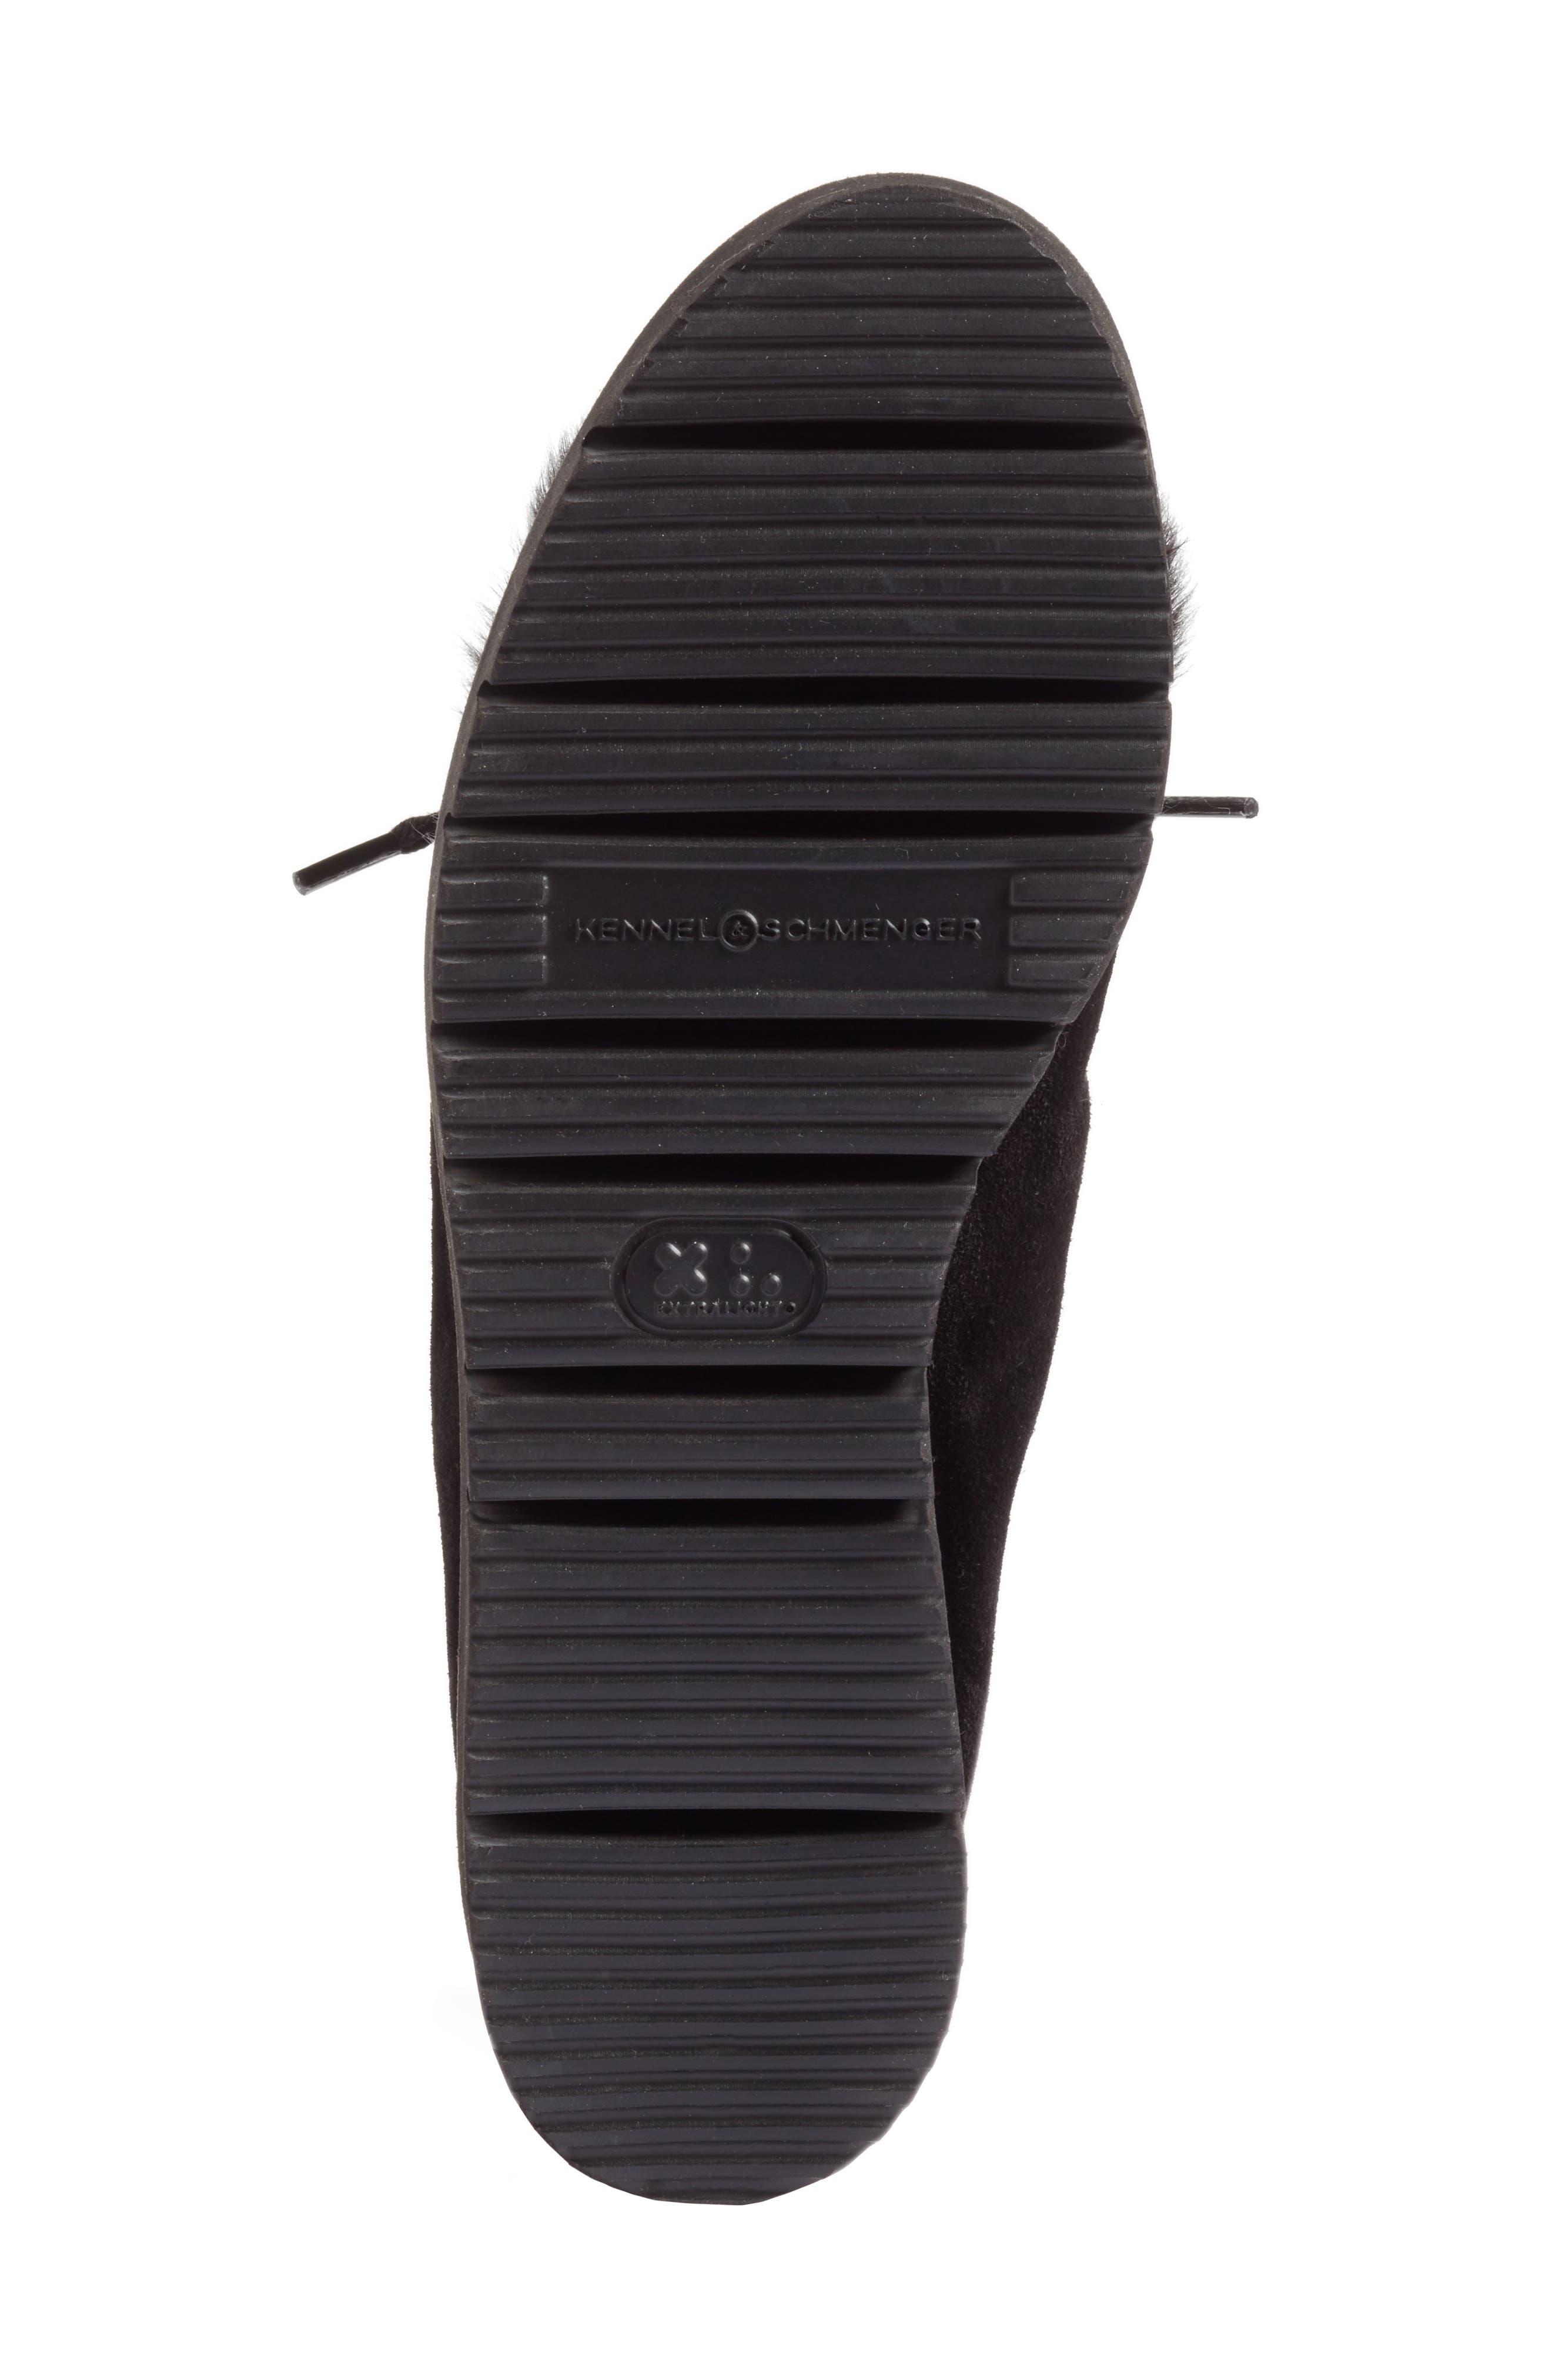 Kennel & Schmenger Malu Suede & Genuine Shearling Slip-On Sneaker,                             Alternate thumbnail 6, color,                             Black